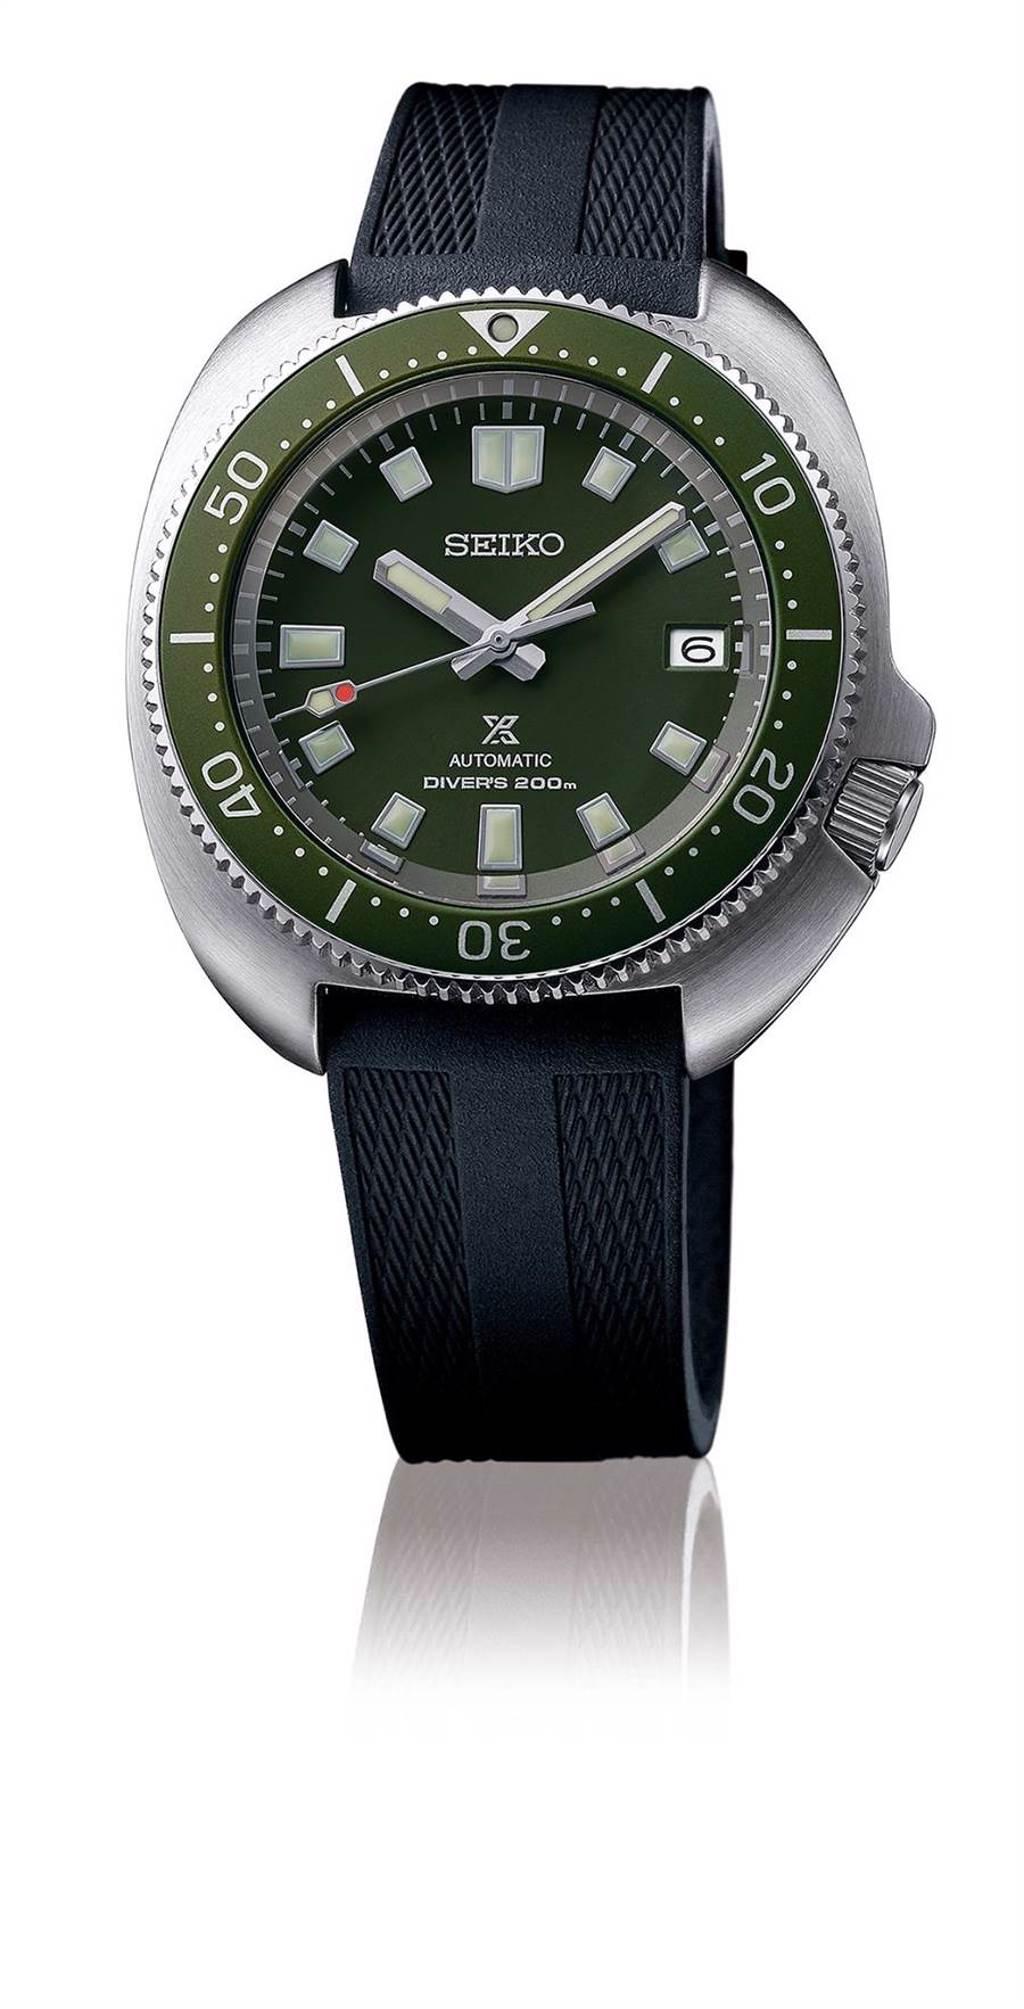 SEIKO Prospex 1970復刻現代表款,防水200米,3萬7000元。(SEIKO提供)